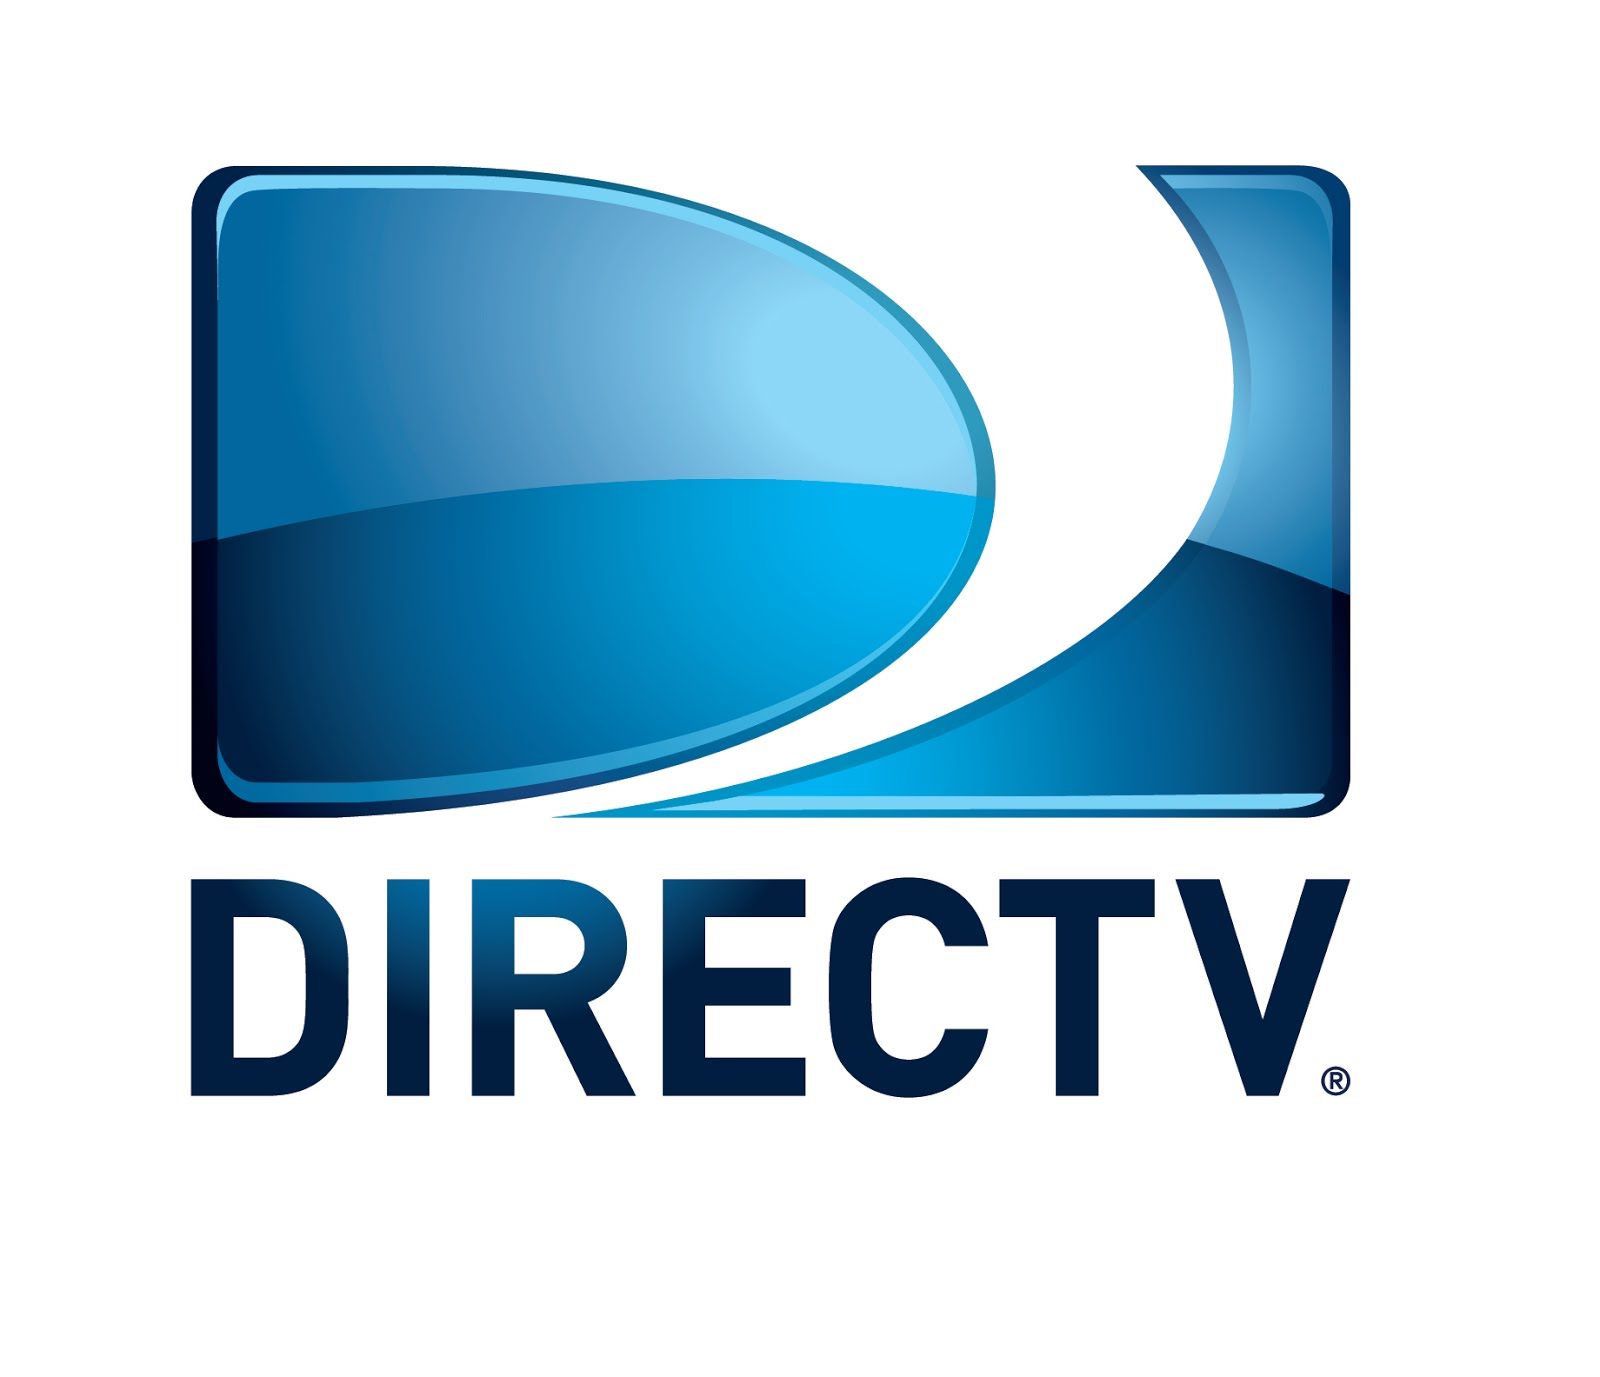 Cientos de fotos: Directv - logo